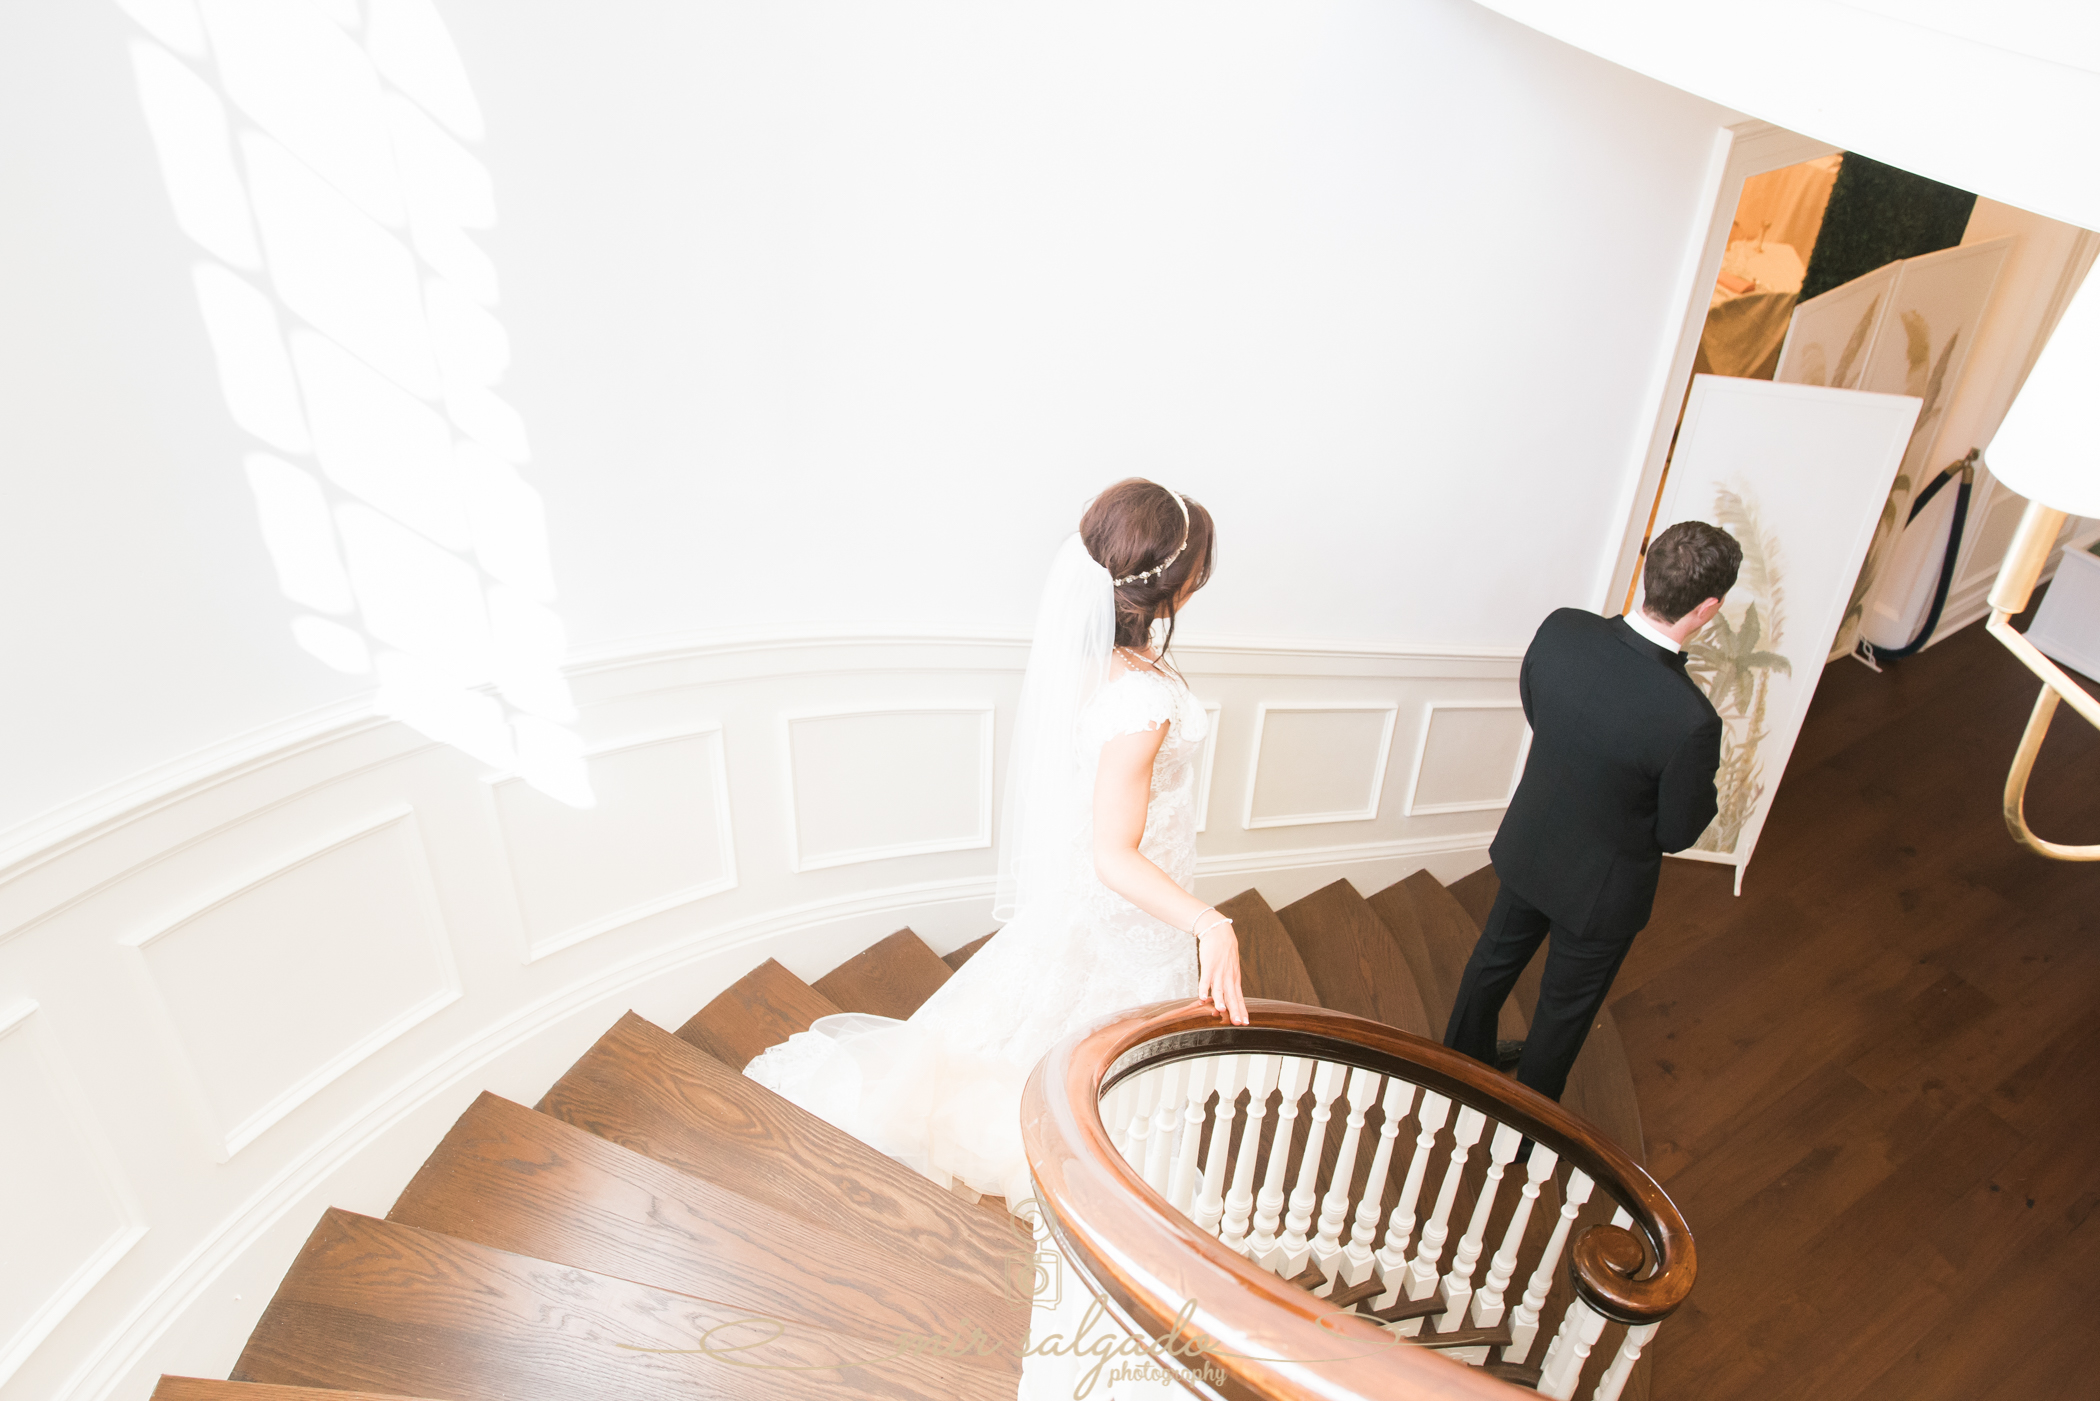 Tampa-yacht-club-wedding, first-look-wedding-photo